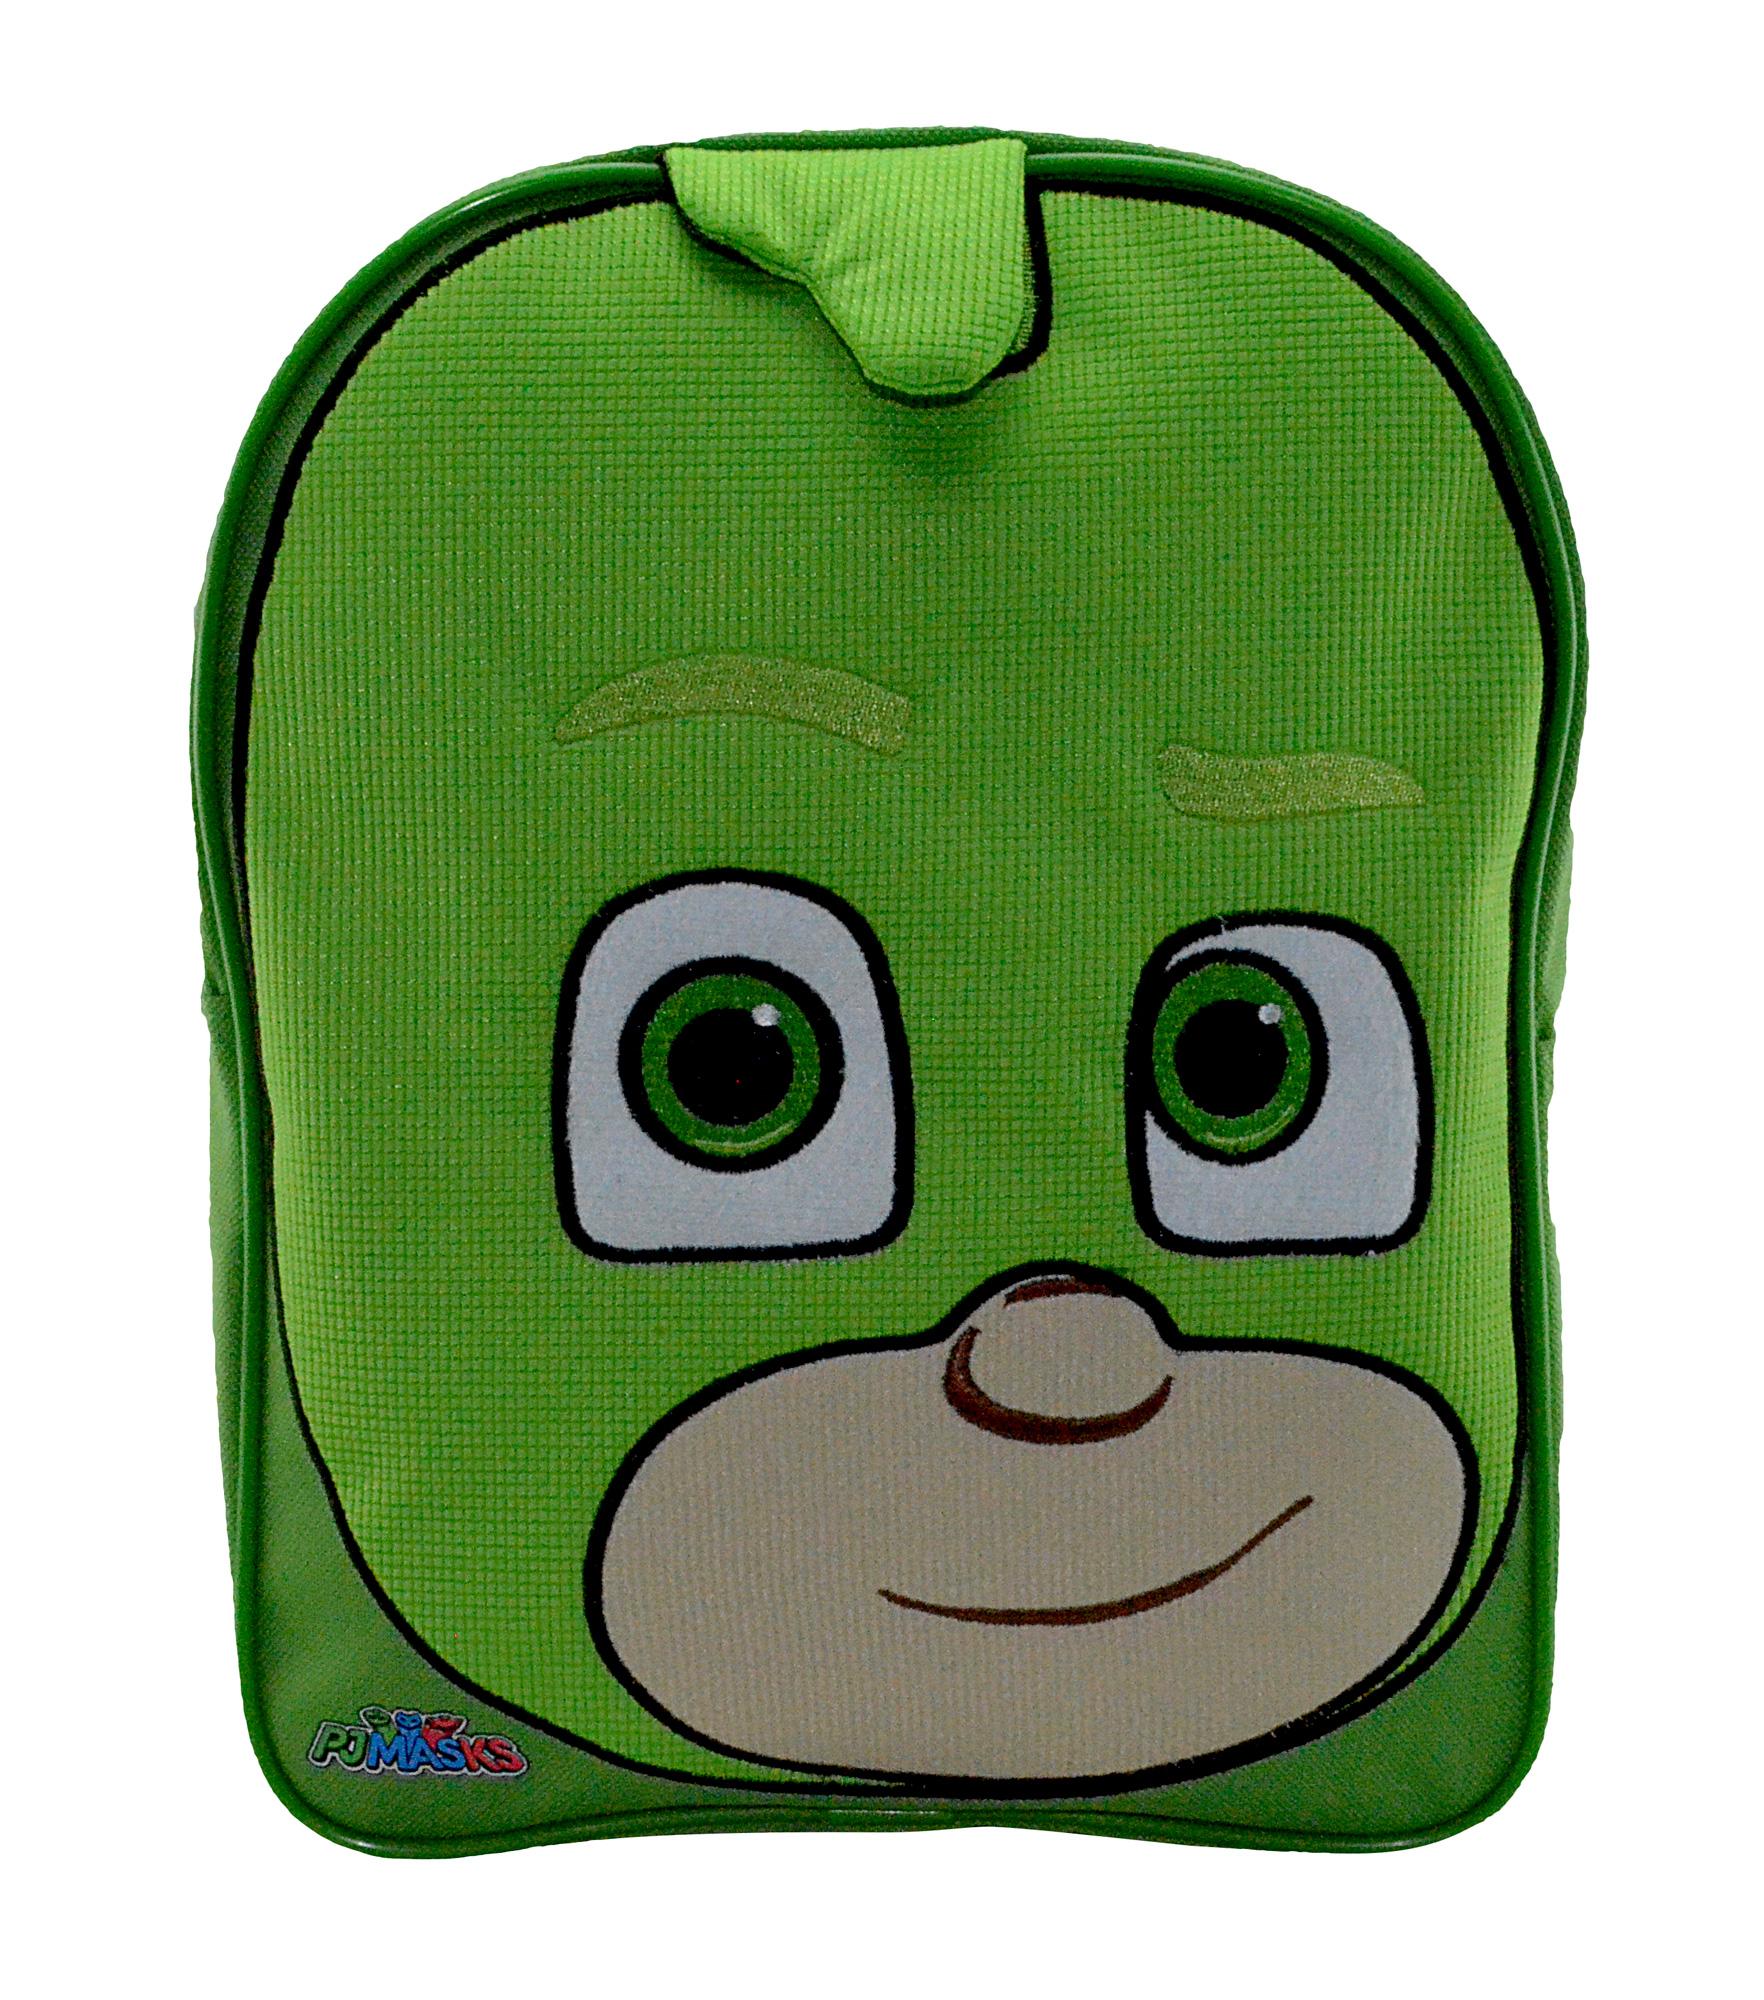 Pj Masks Gekko Novelity School Bag Rucksack Backpack